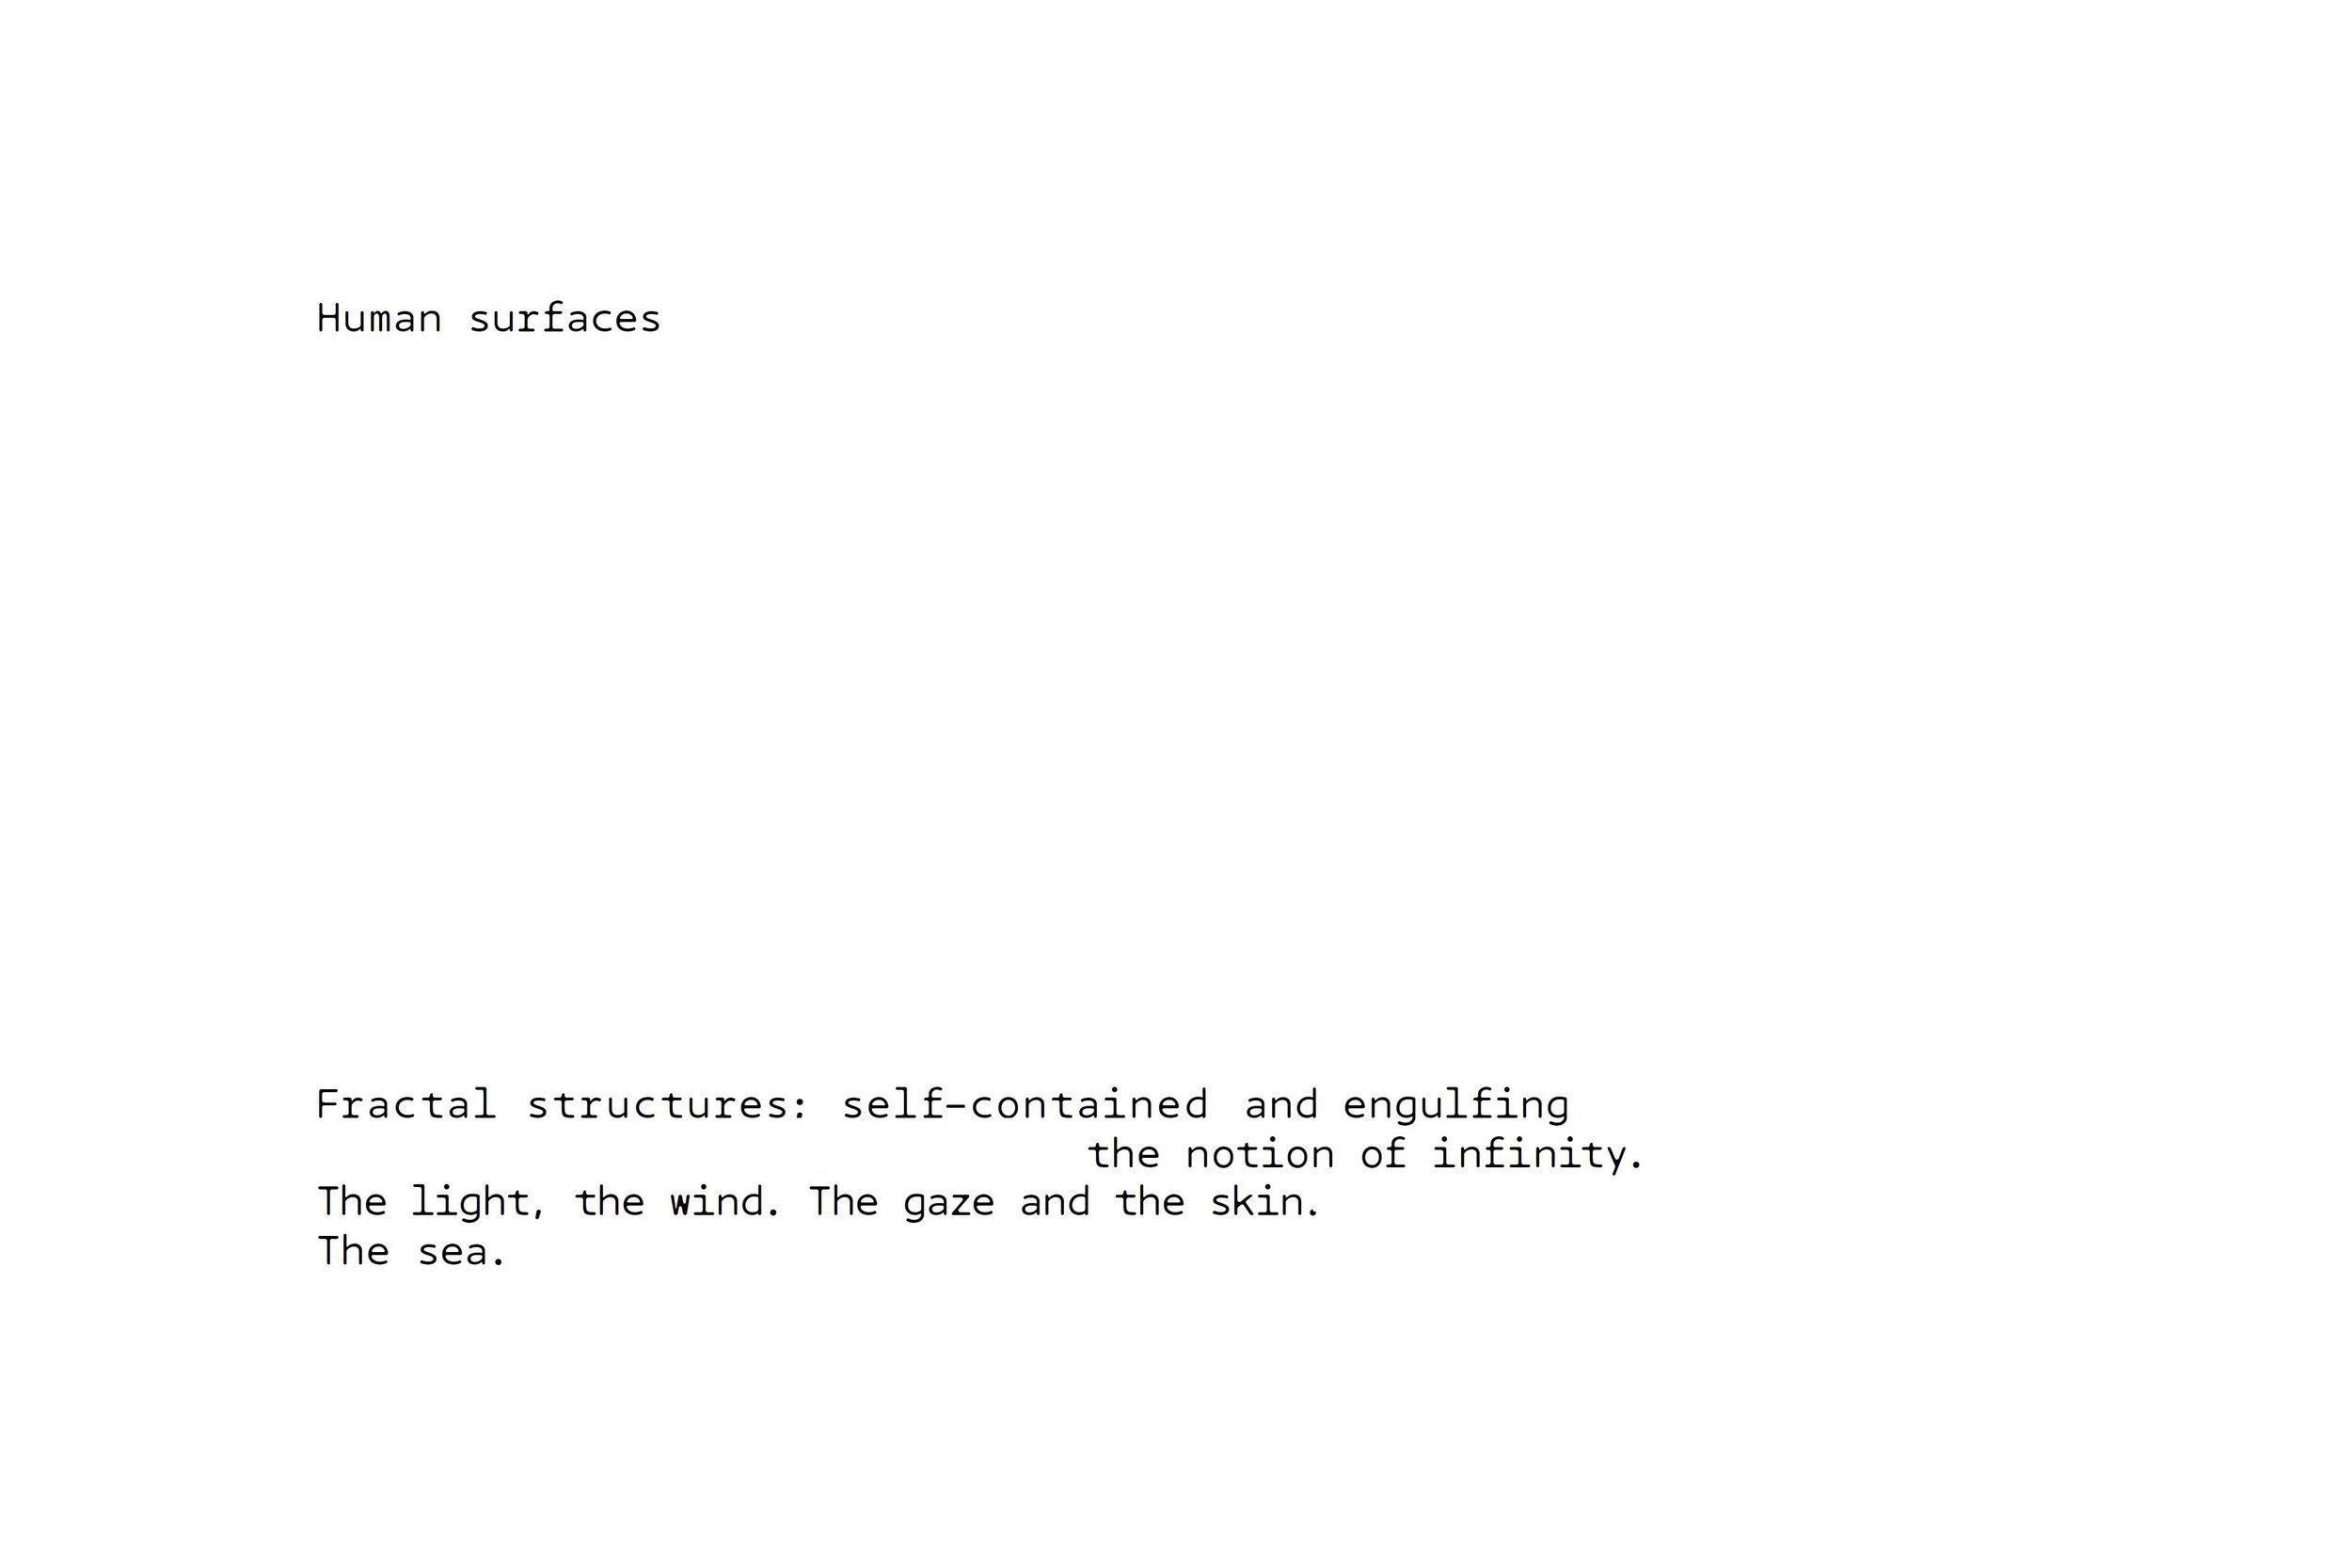 AristotelisChatzikyrouHS-text.jpg